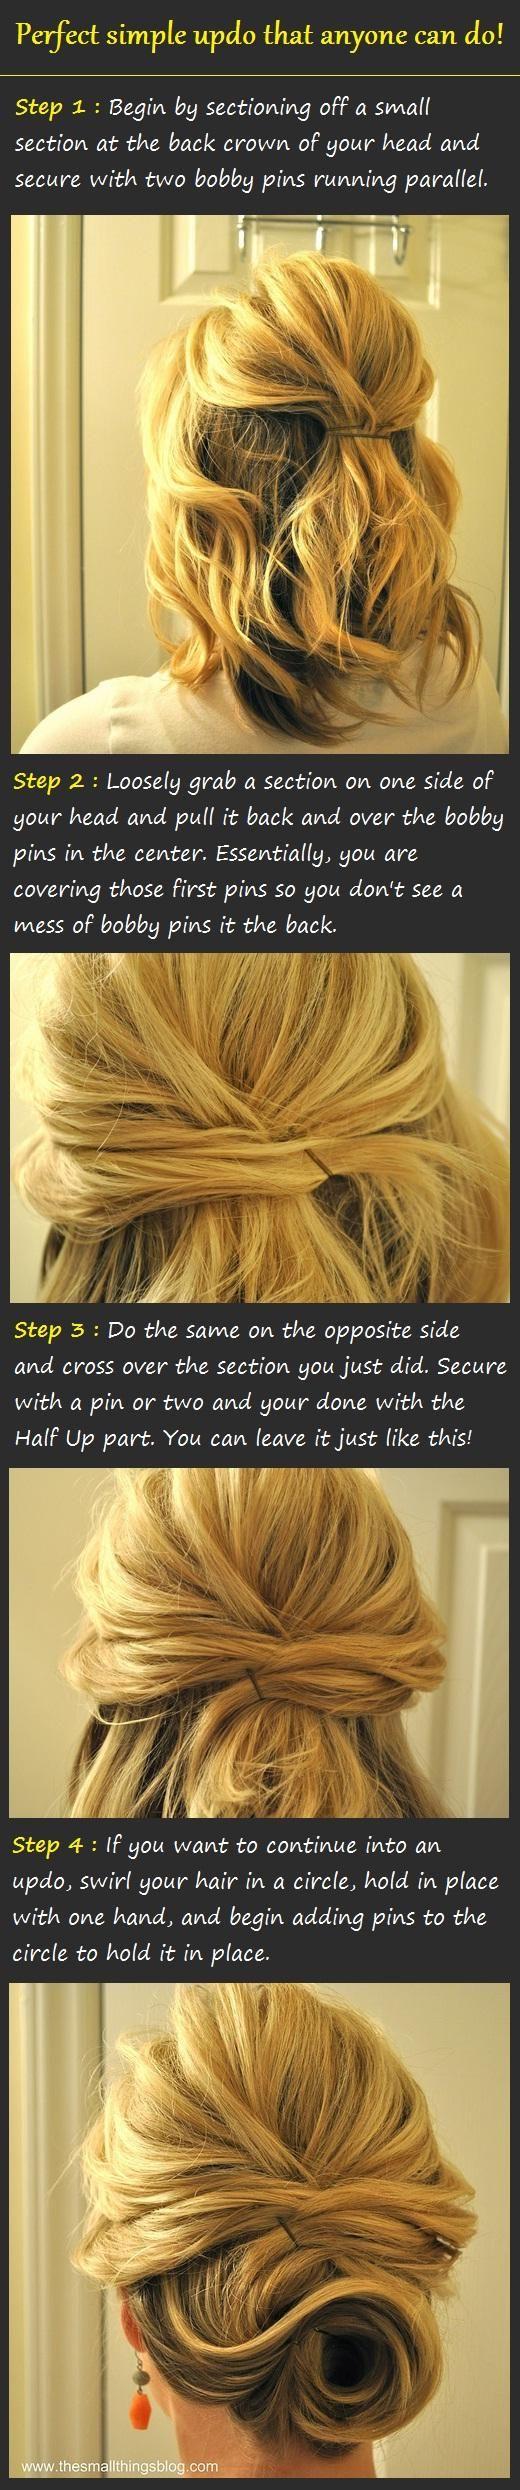 Chic updo so simple hair pinterest hair hair styles and